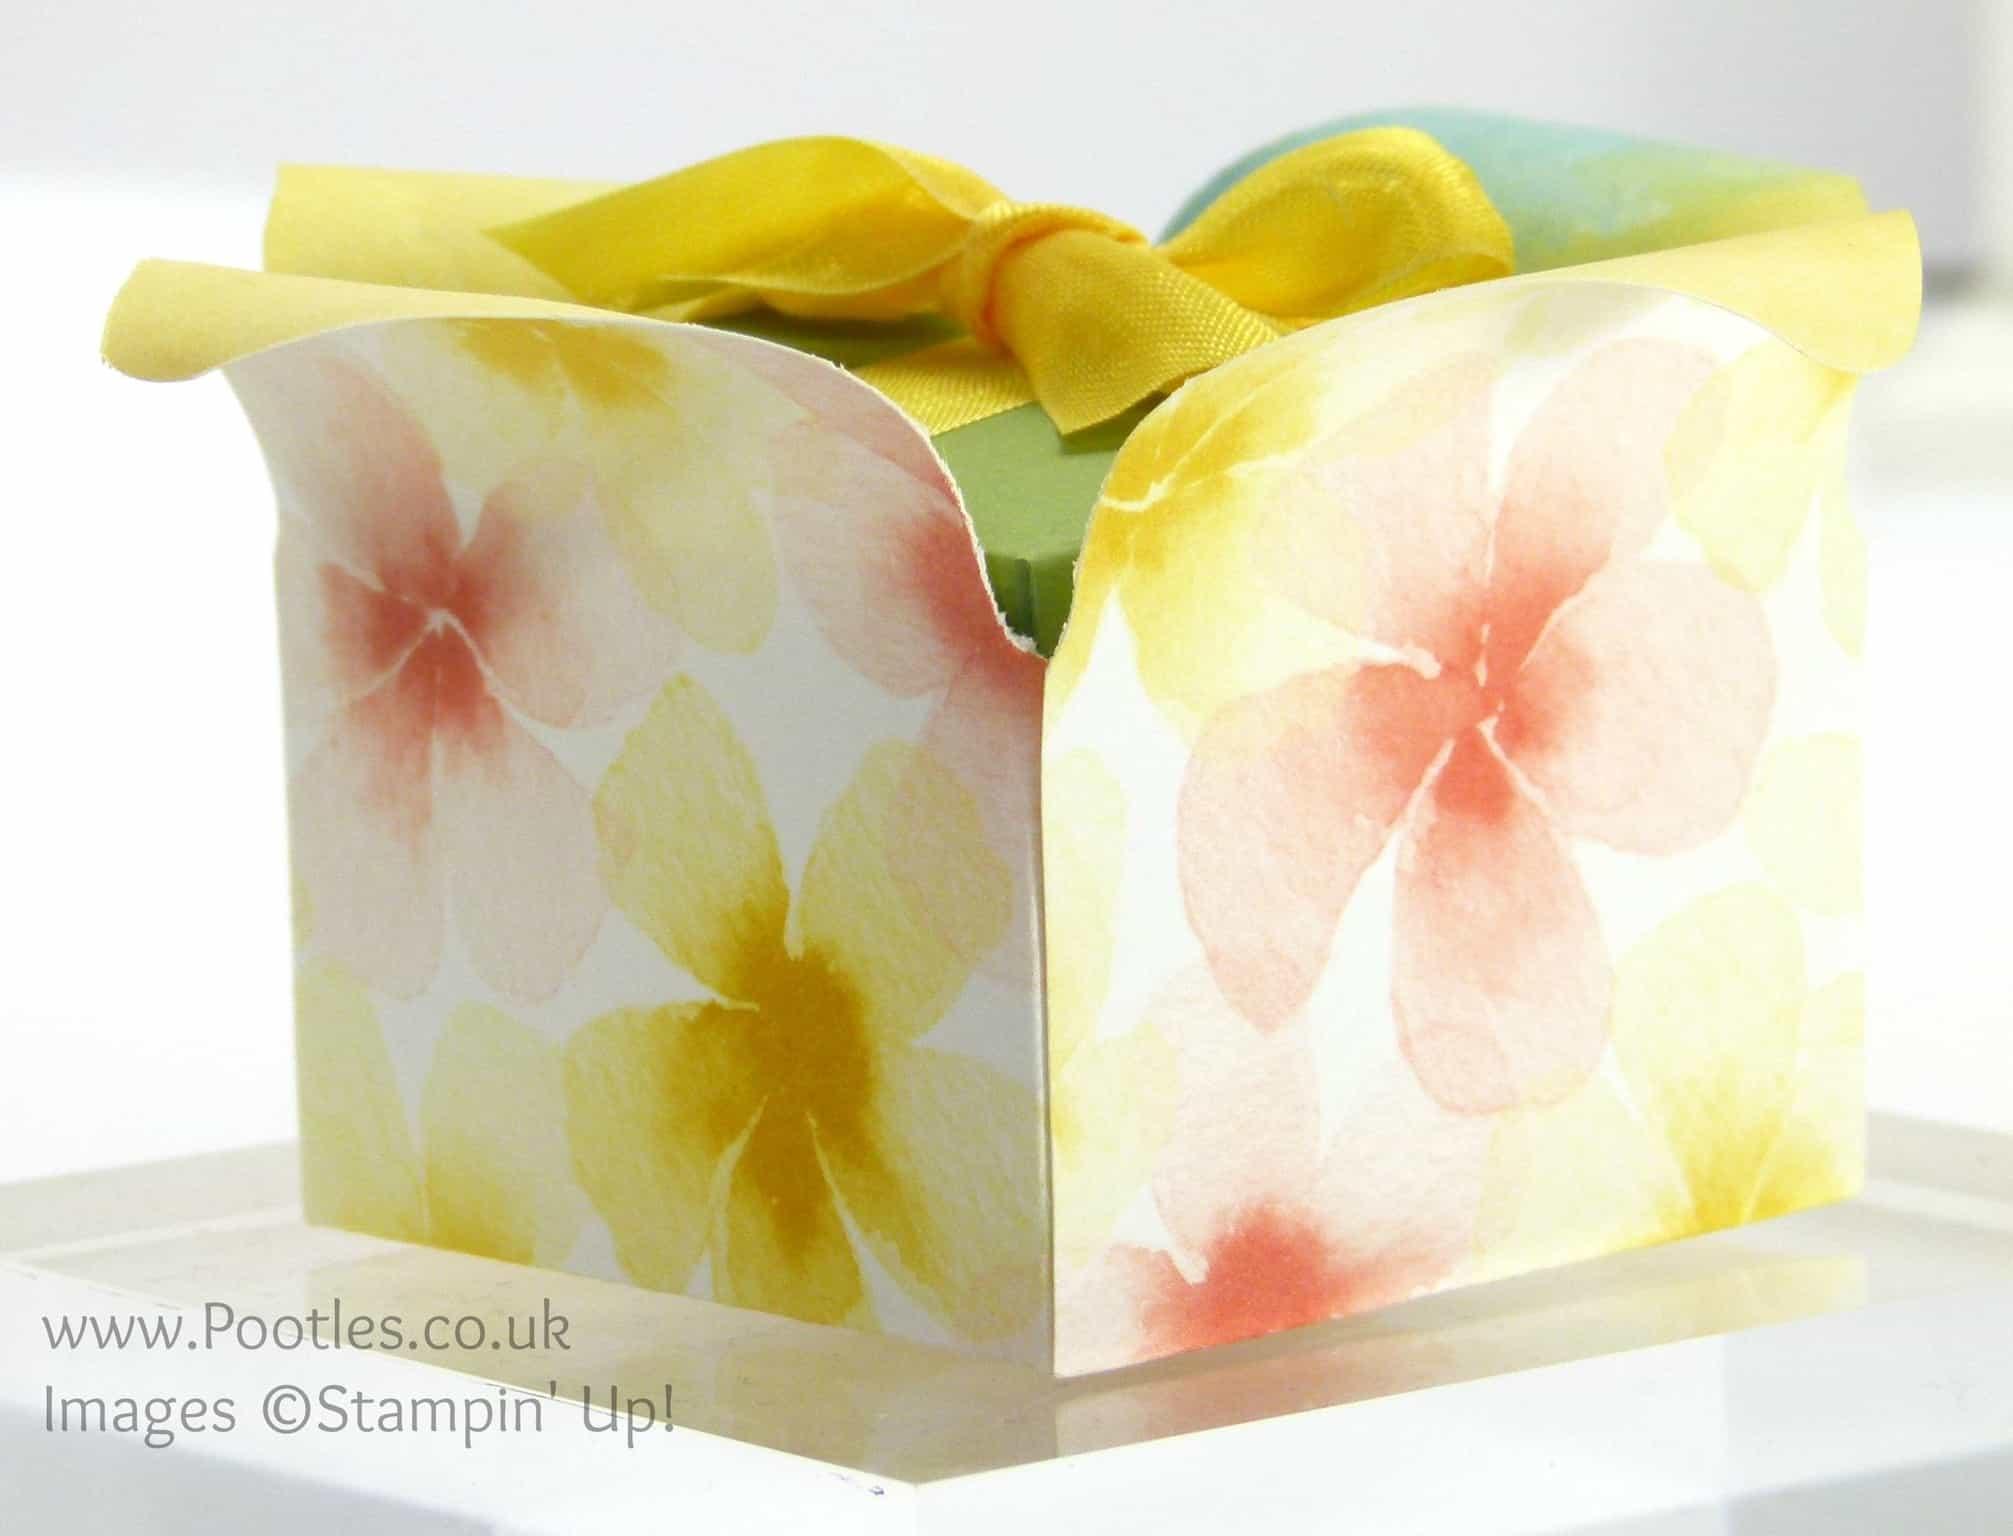 Stampin' up! UK Independent Demonstrator Pootles. Adorable Envelope Punch Board Box in a Flower Tutorial Side Profile